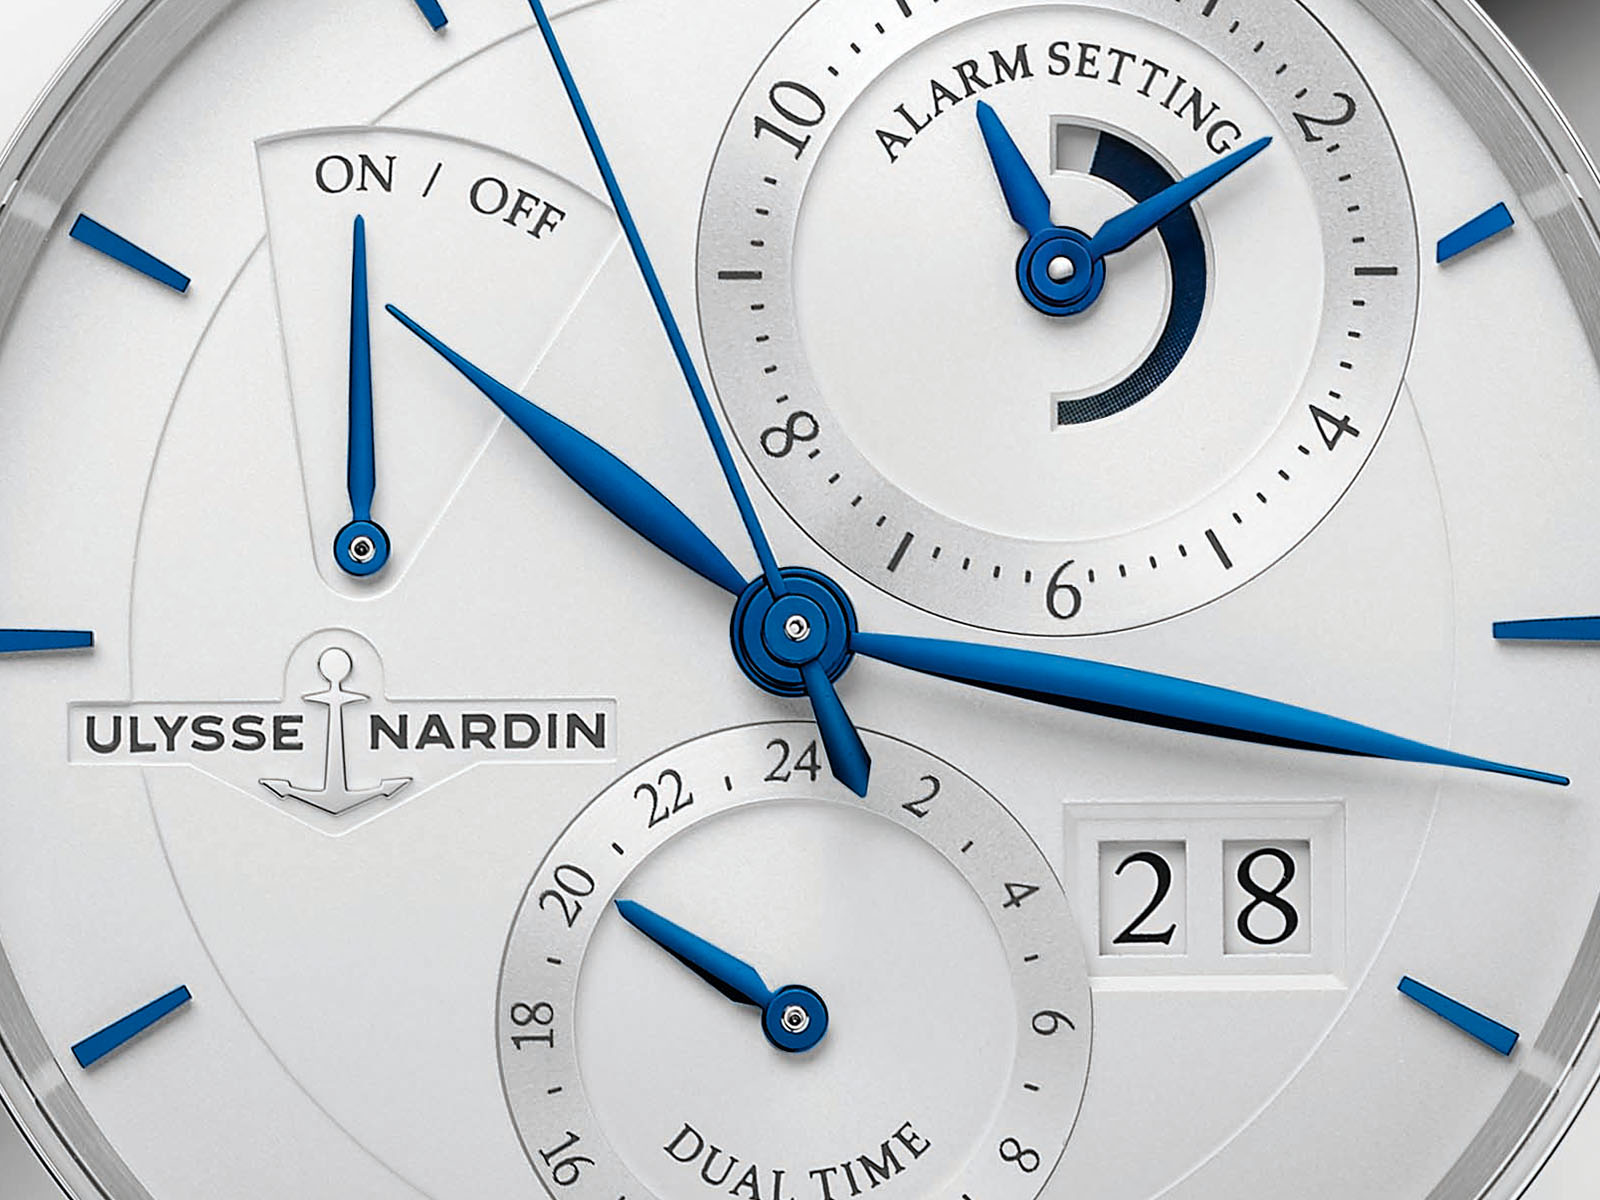 Ulysse-Nardin-Classic-Sonata-673-05_90-4.jpg